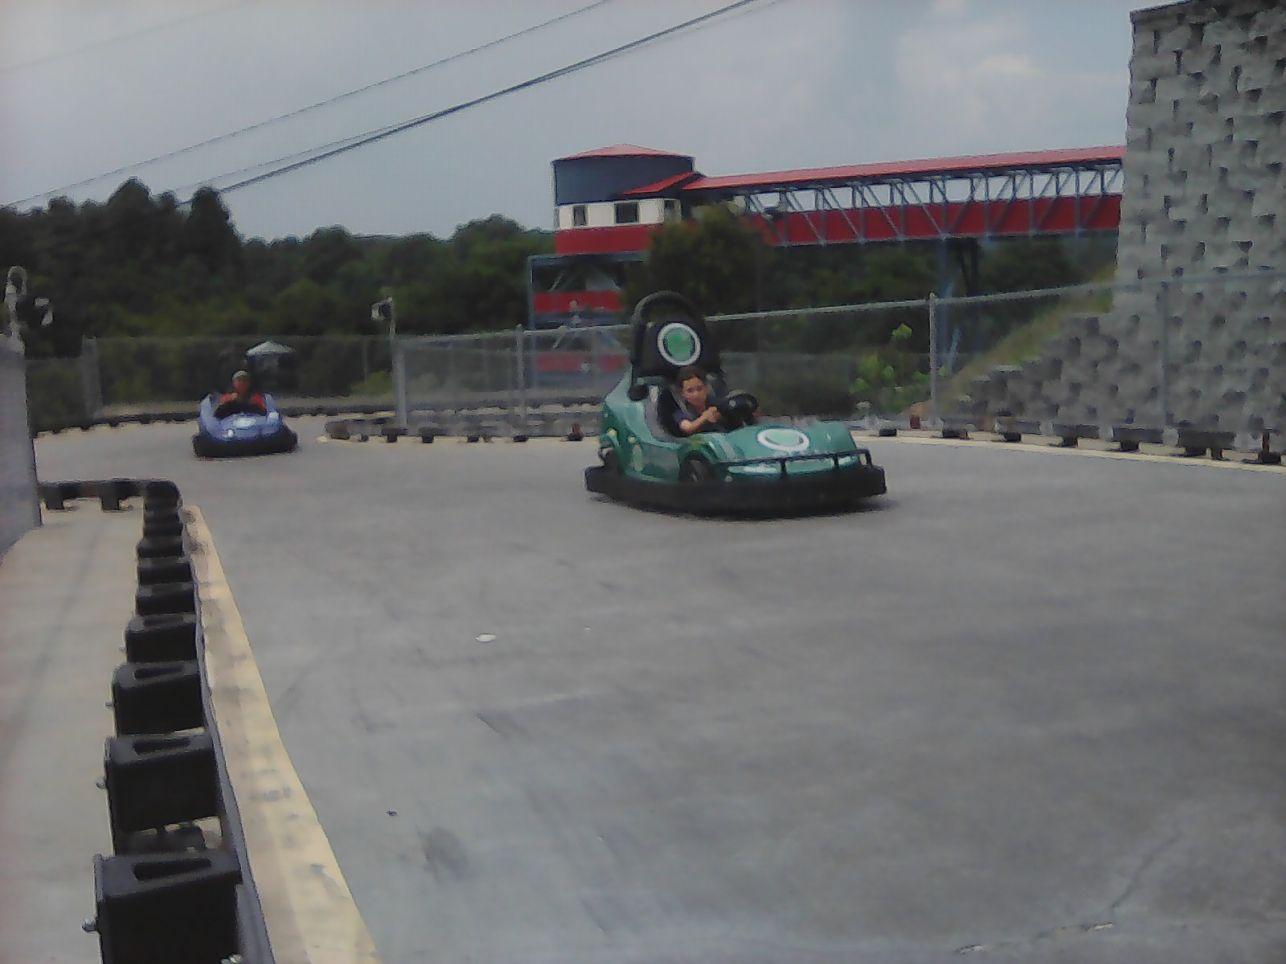 Go Karts at Asheville Fun Depot